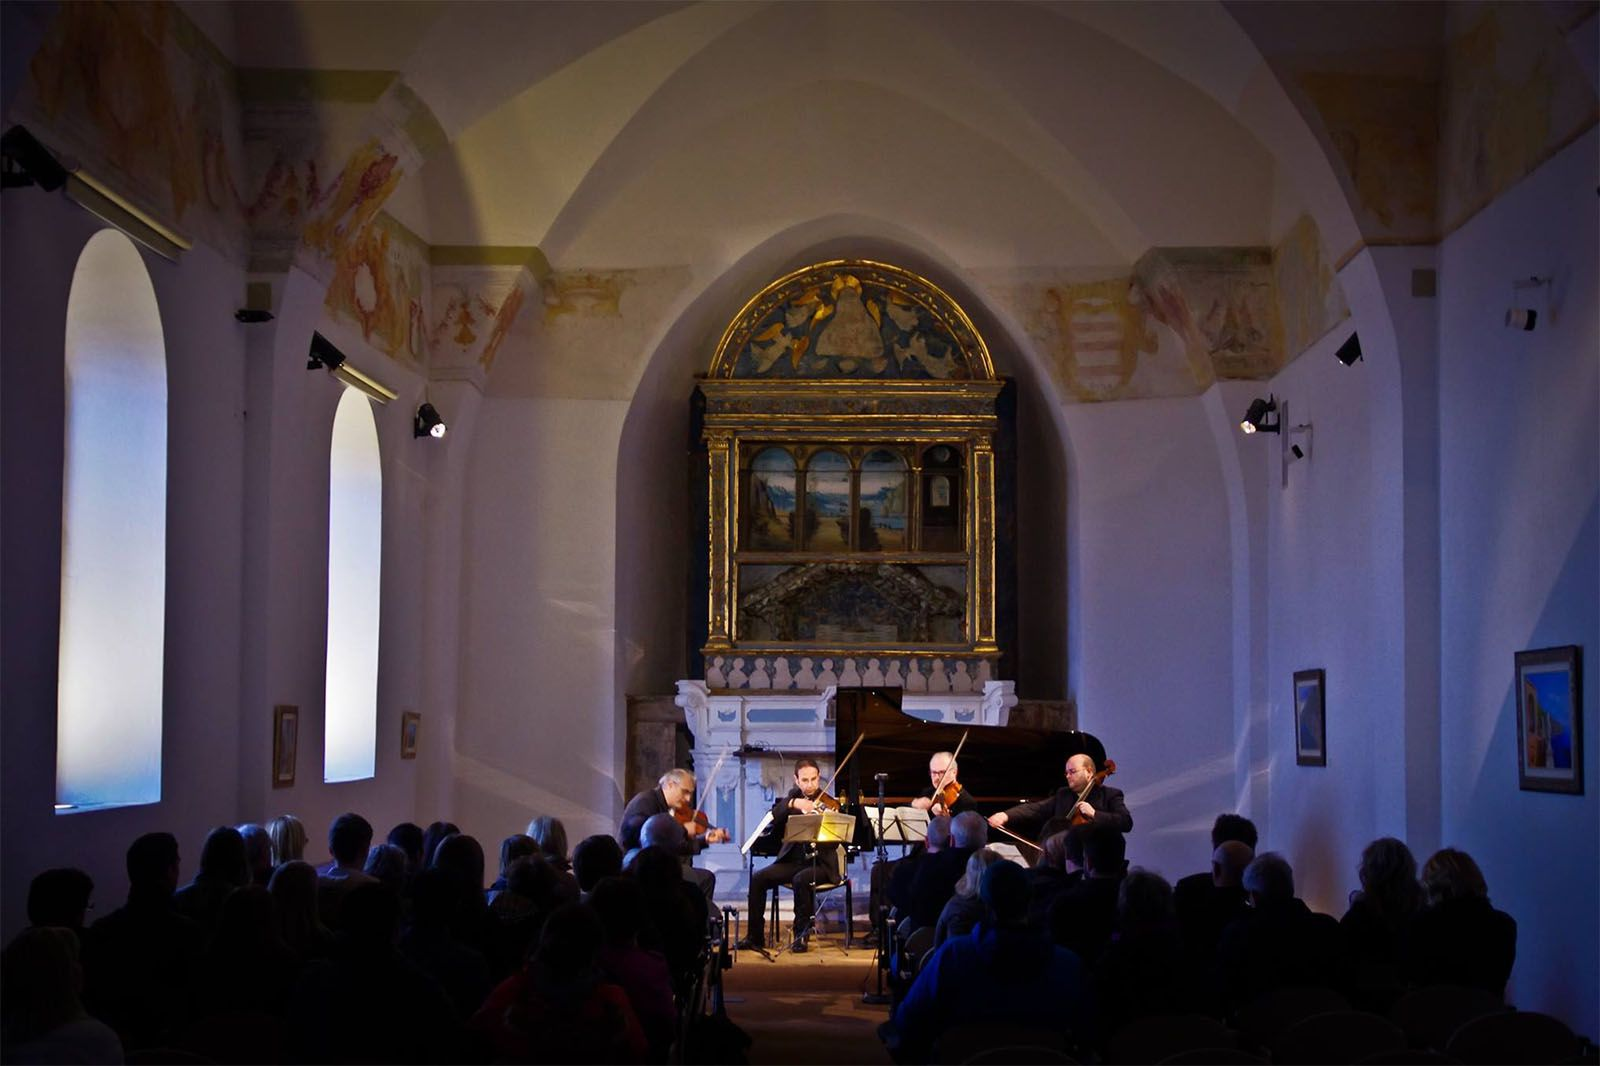 ravello concert historic building